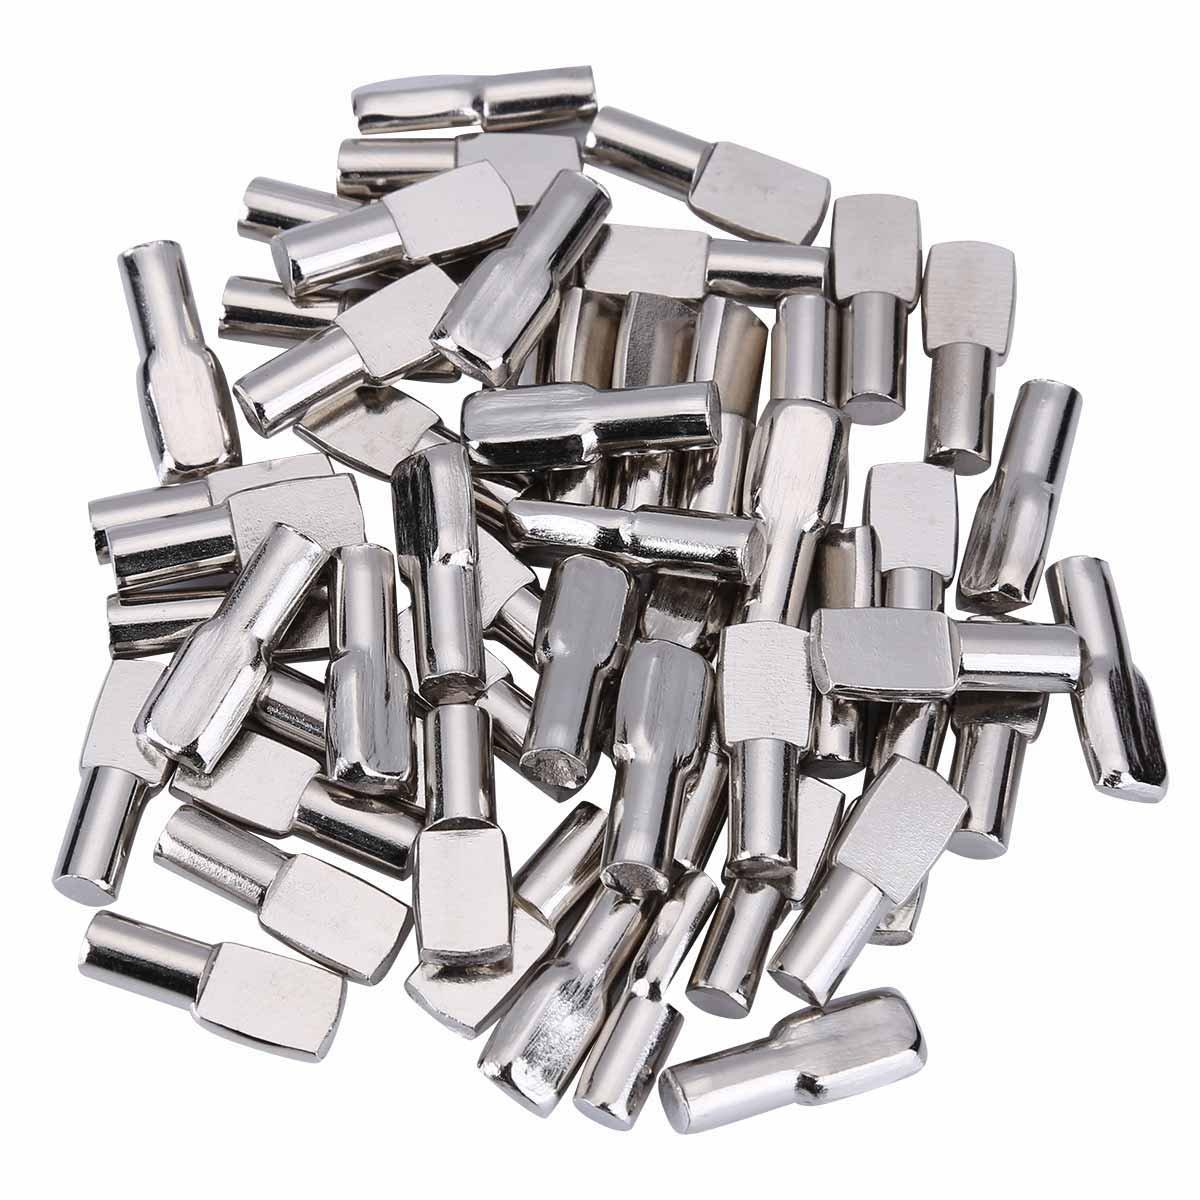 120 Packs Shelf Pins, 5mm Shelf Support Pegs Spoon Shape Cabinet Furniture